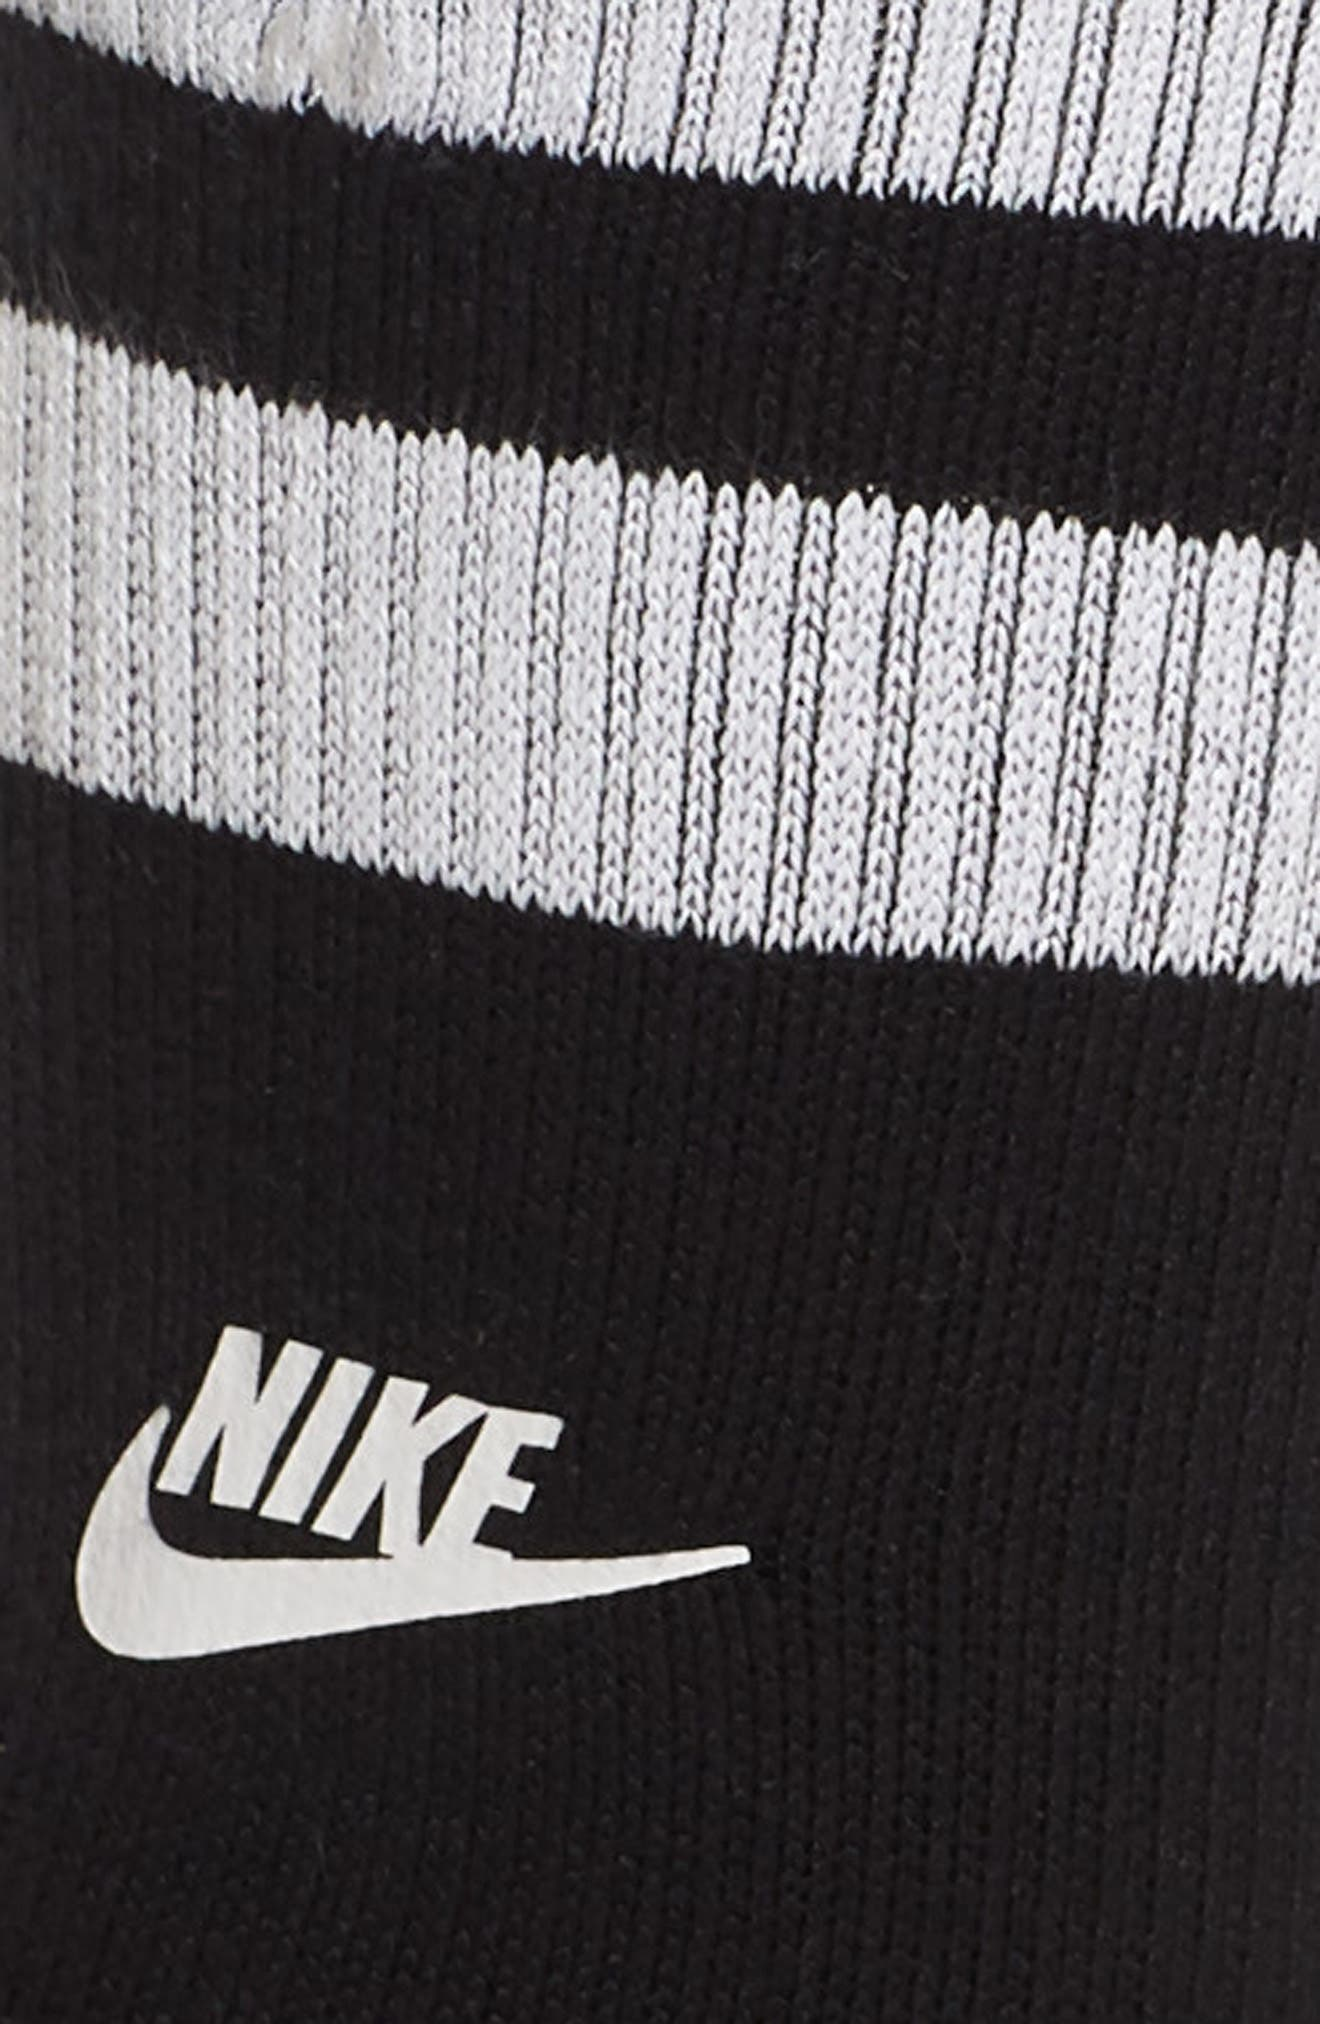 Stripe Top Crew Socks,                             Alternate thumbnail 2, color,                             Black/ White